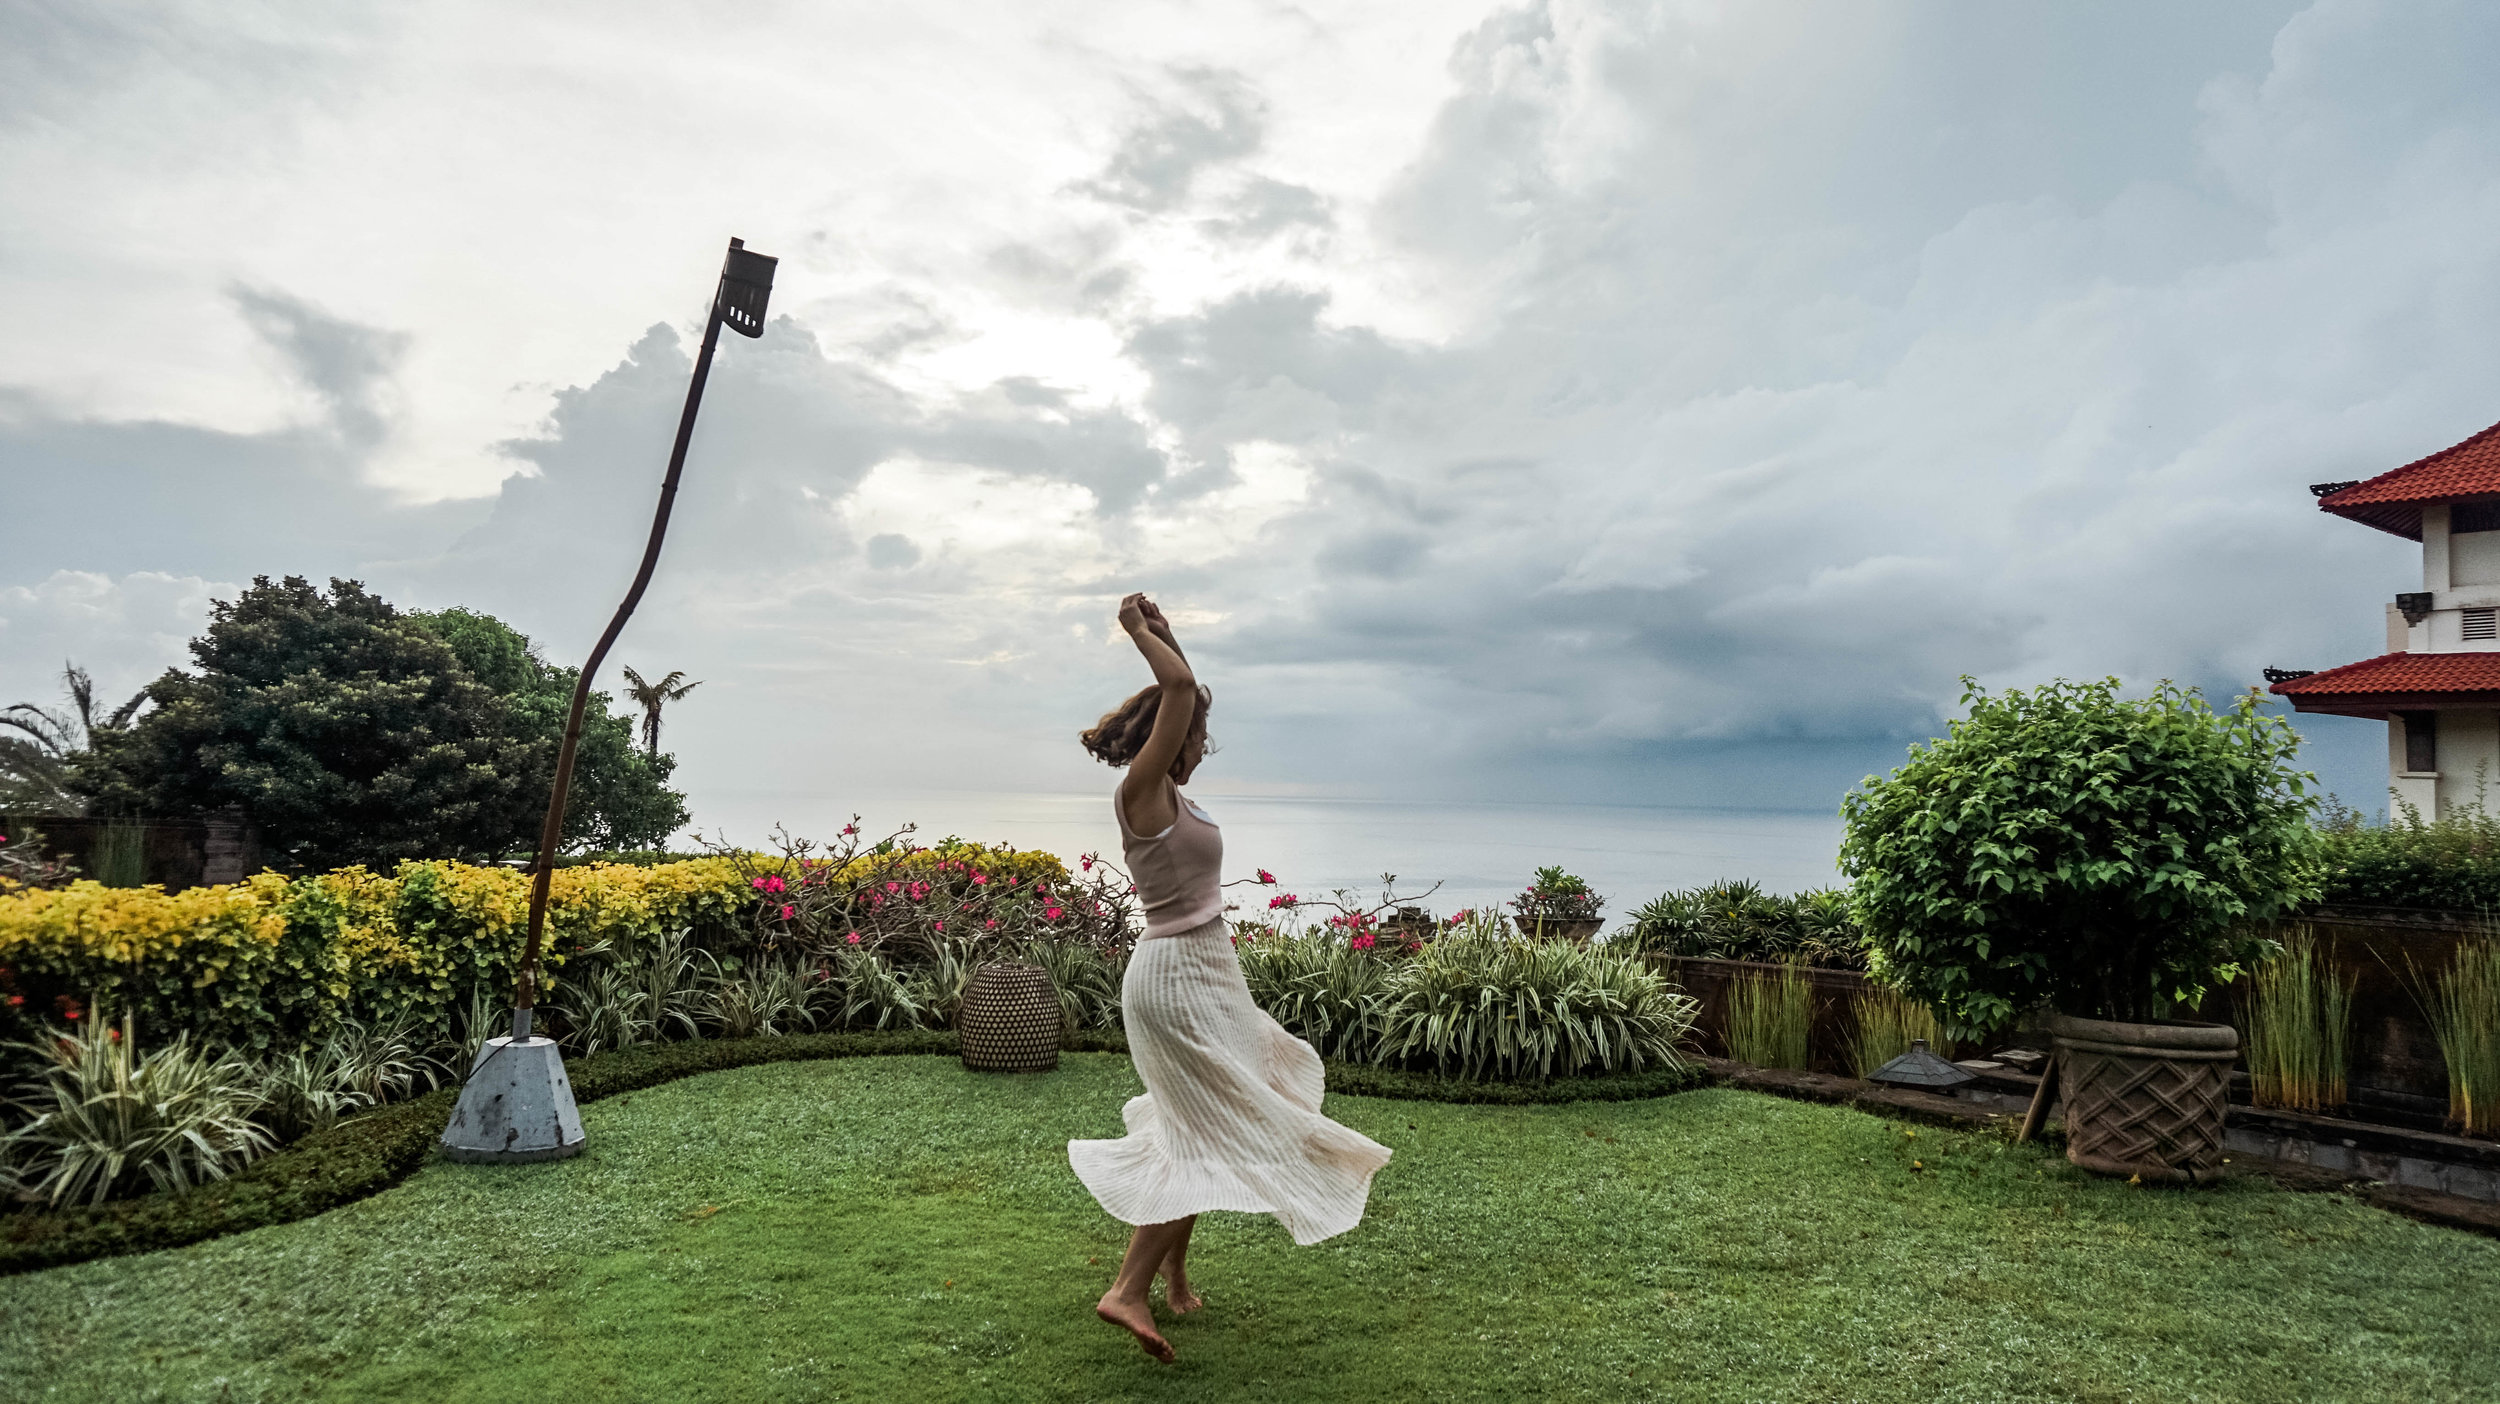 Hilton Bali Resort - you make me so happy!